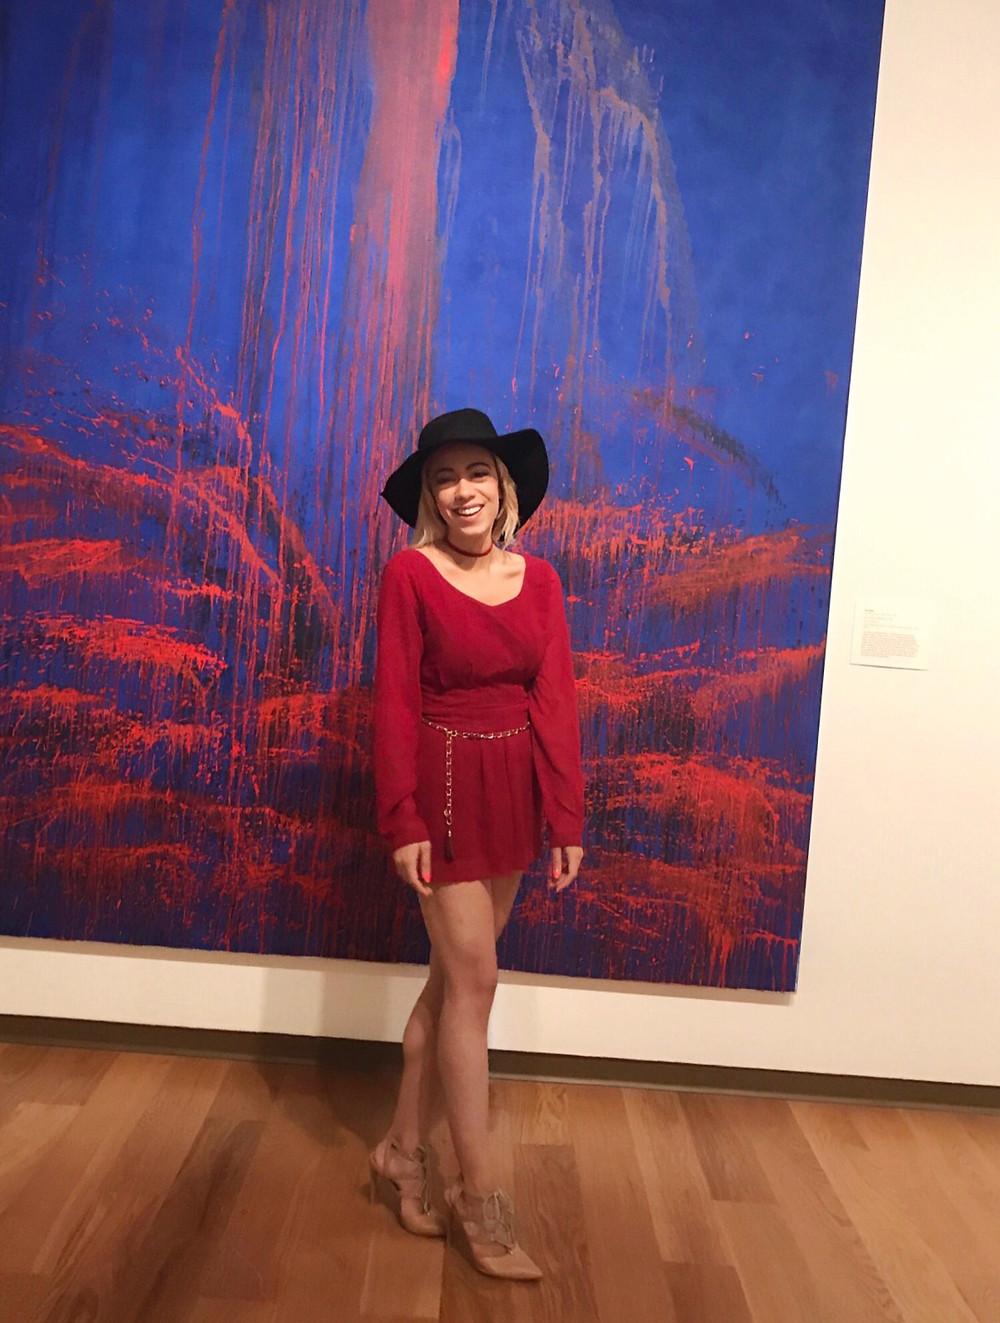 Katrina Belle - Katrina Belle Beauty - Orlando fashion blogger - red romper